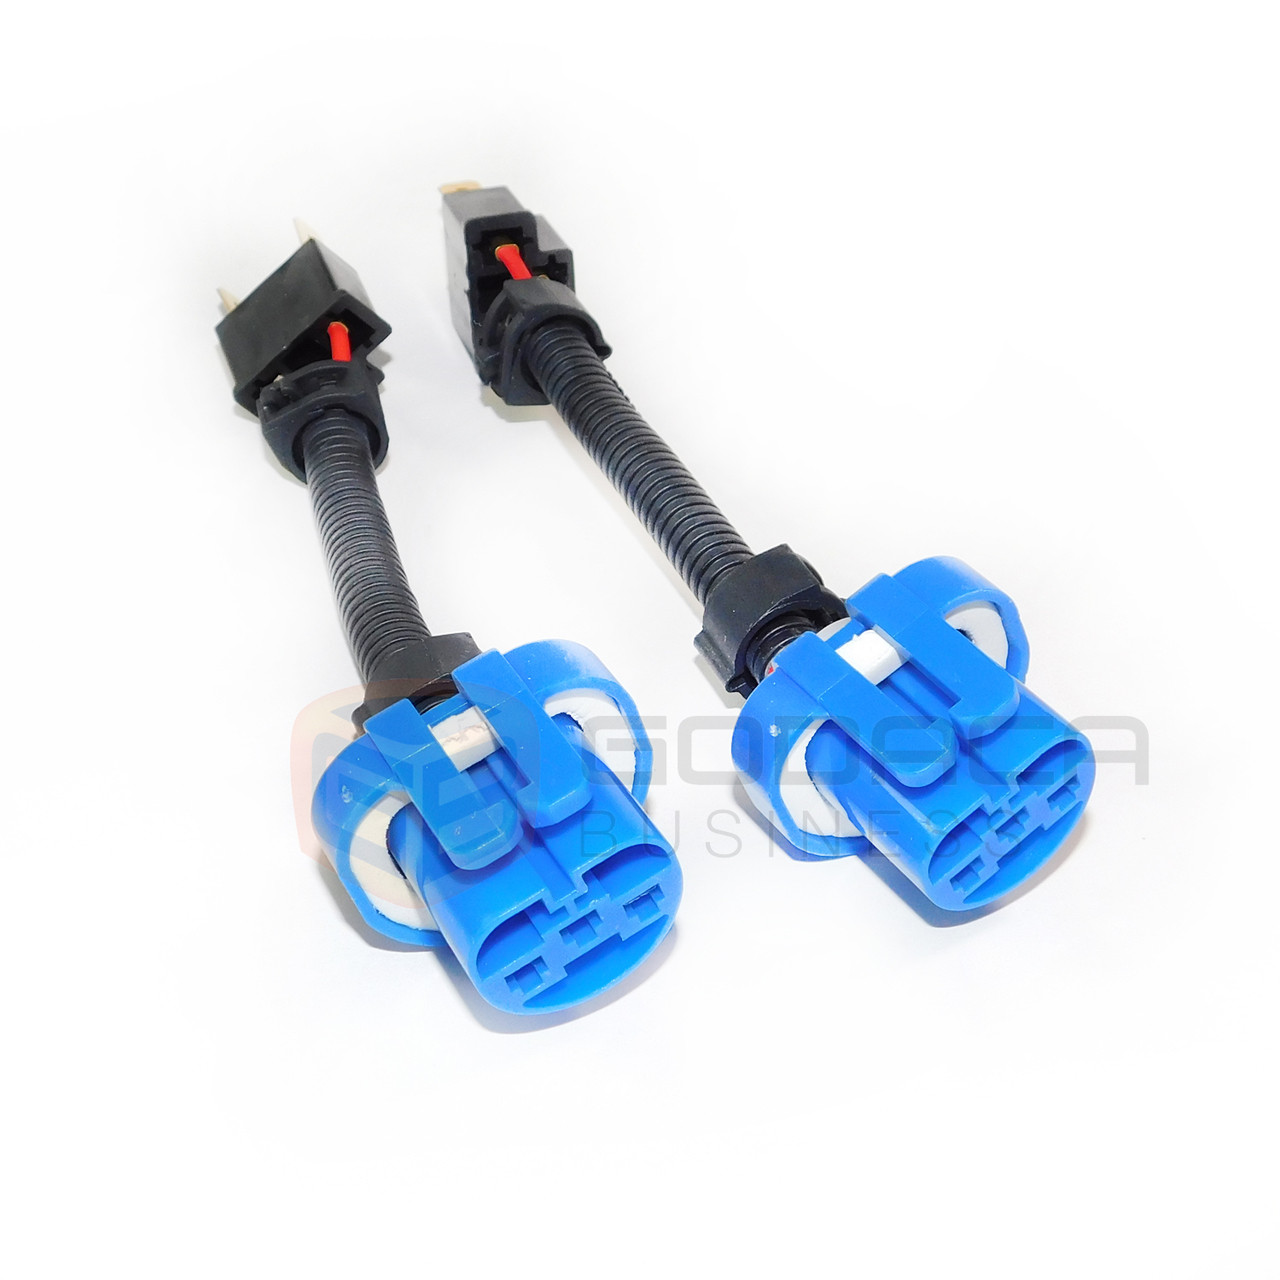 medium resolution of 2x h4 9003 to 9007 hb5 headlight wiring conversion adapter plug play godaca llc